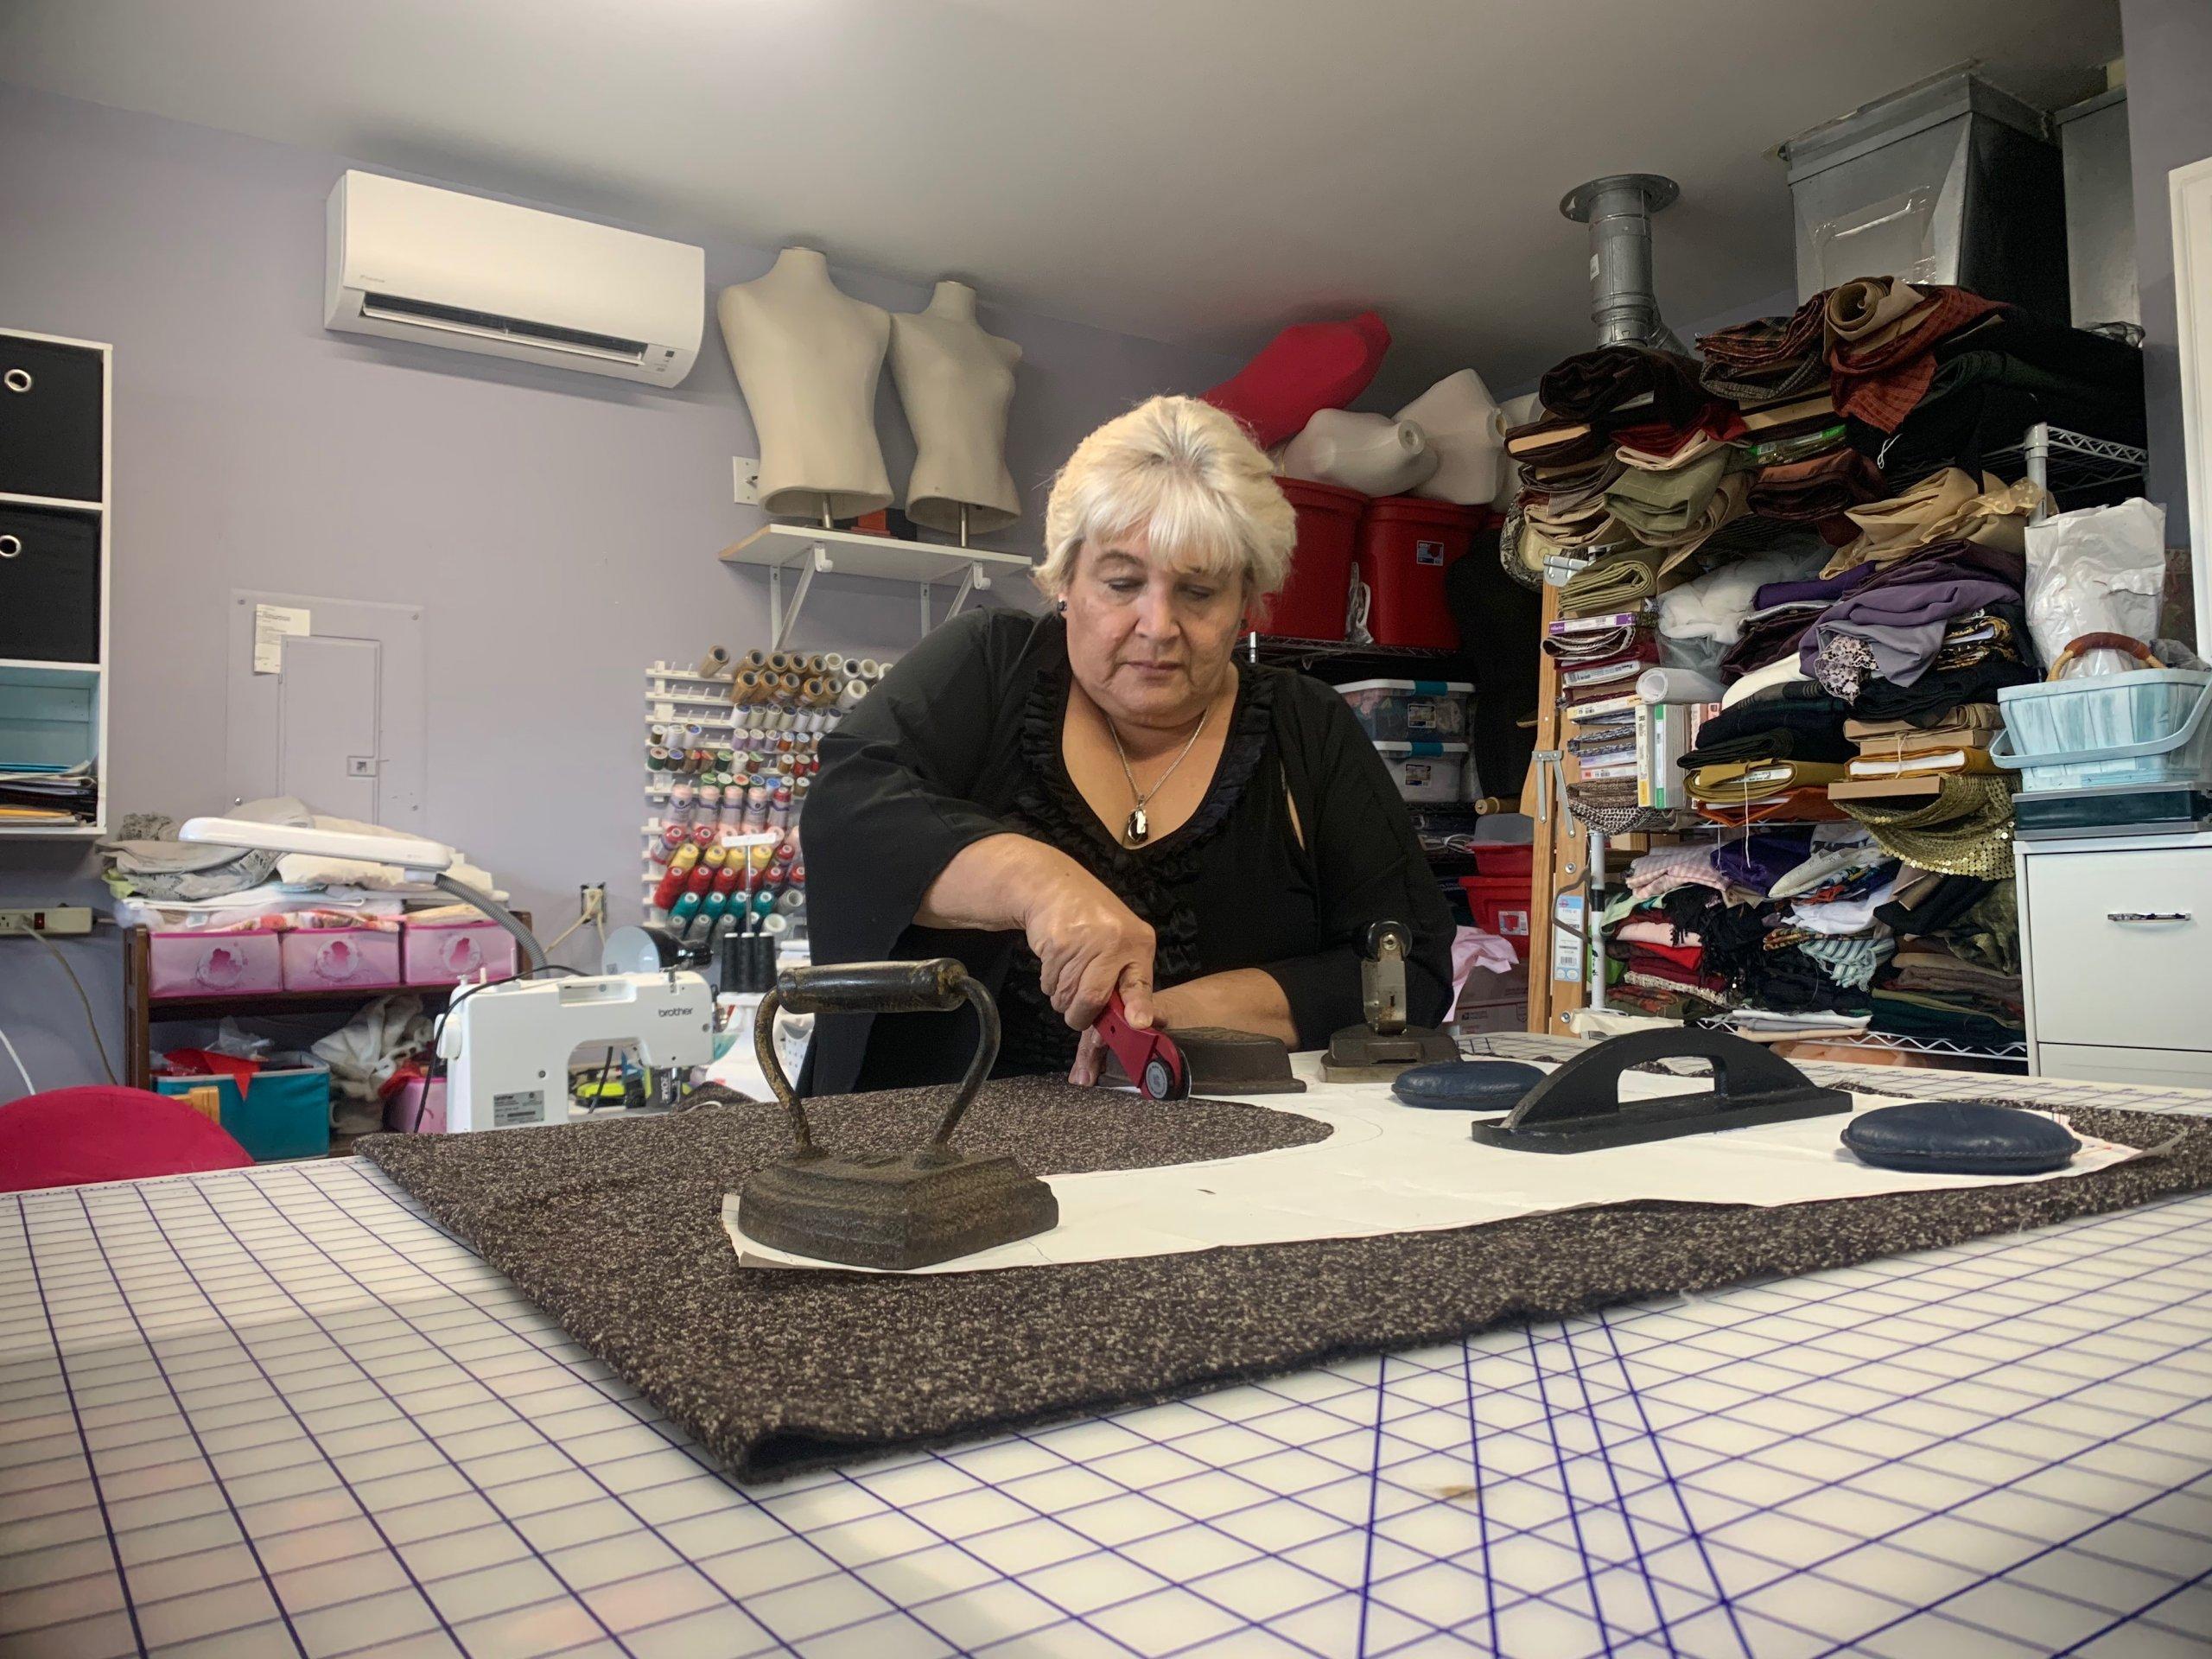 Maria cutting patterns